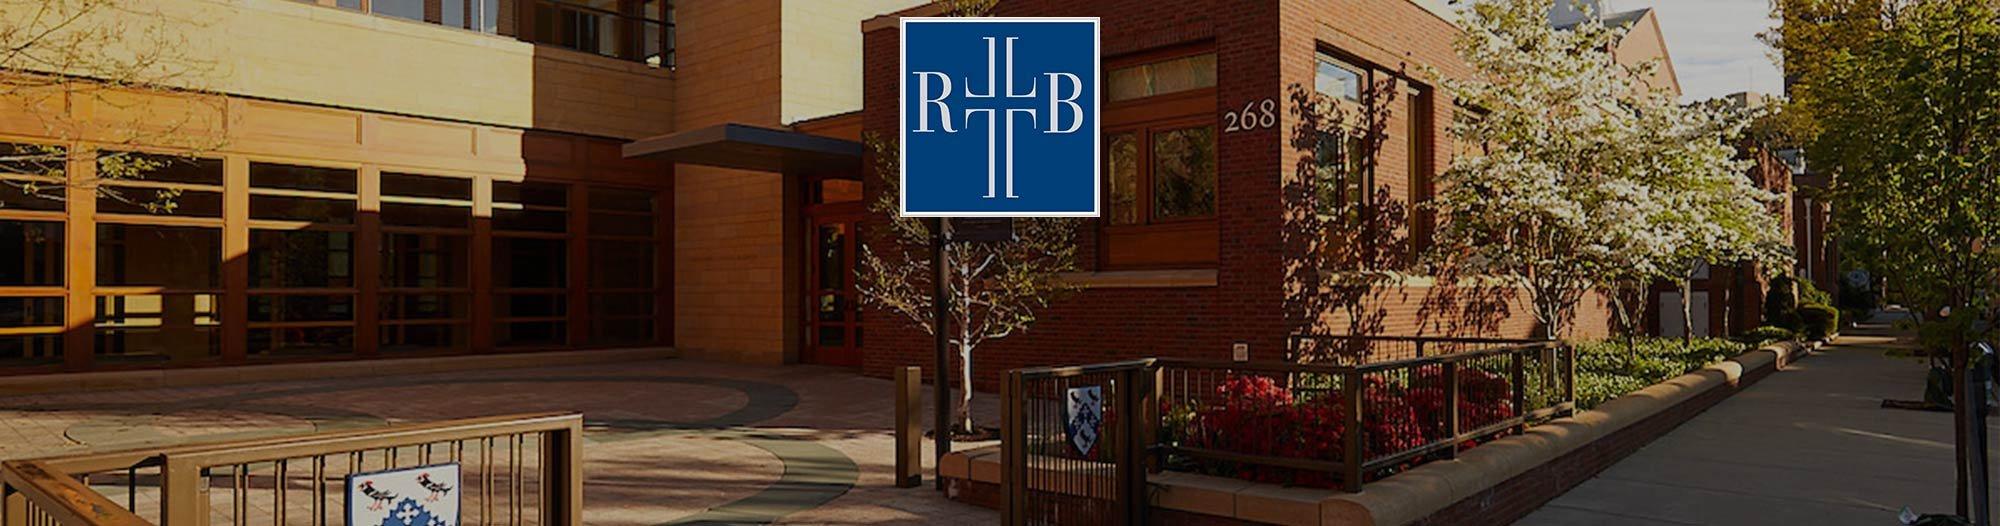 RLB-Page-Header-1-2000x526